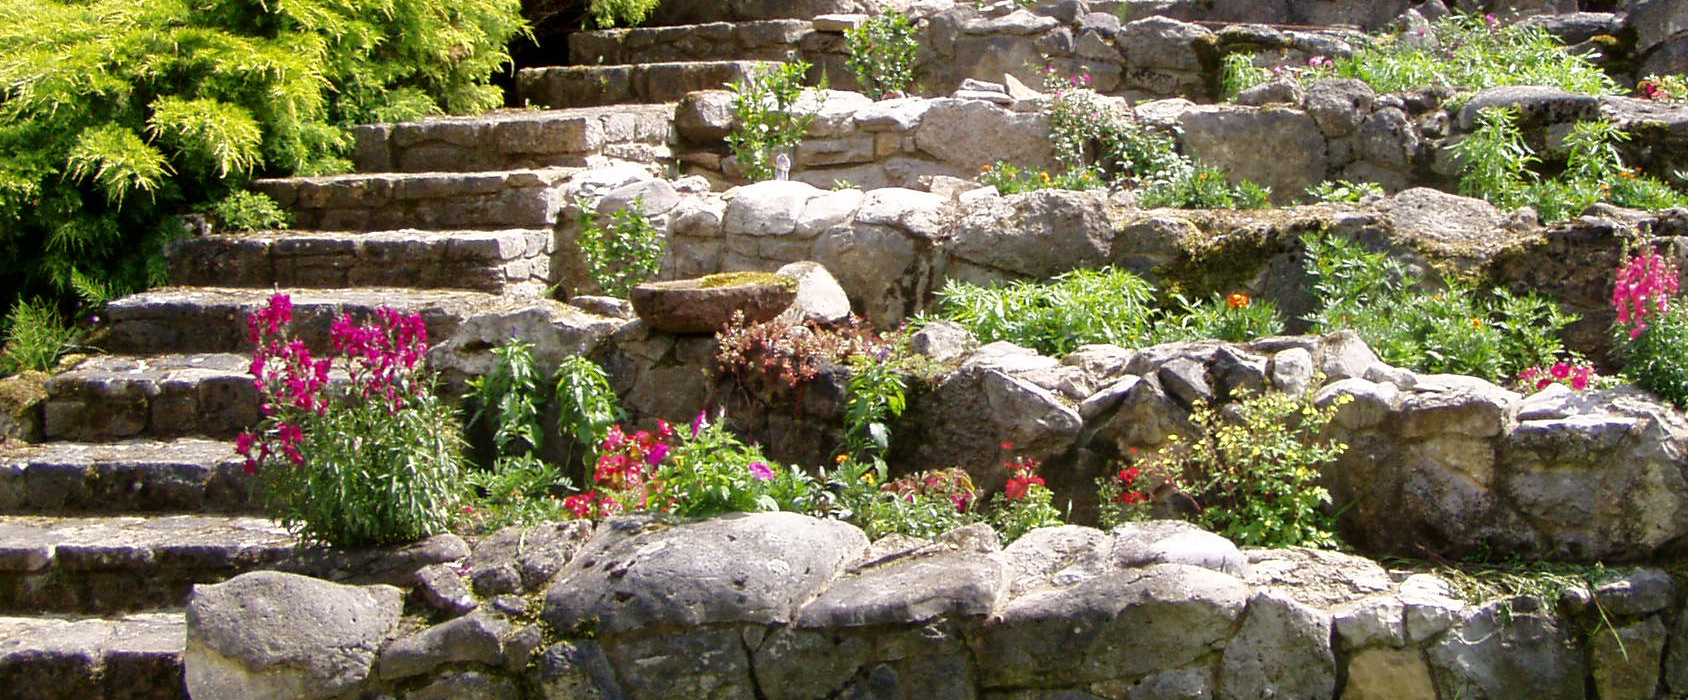 Ideen Gestaltung Steingarten Hang: Steingartengestaltung